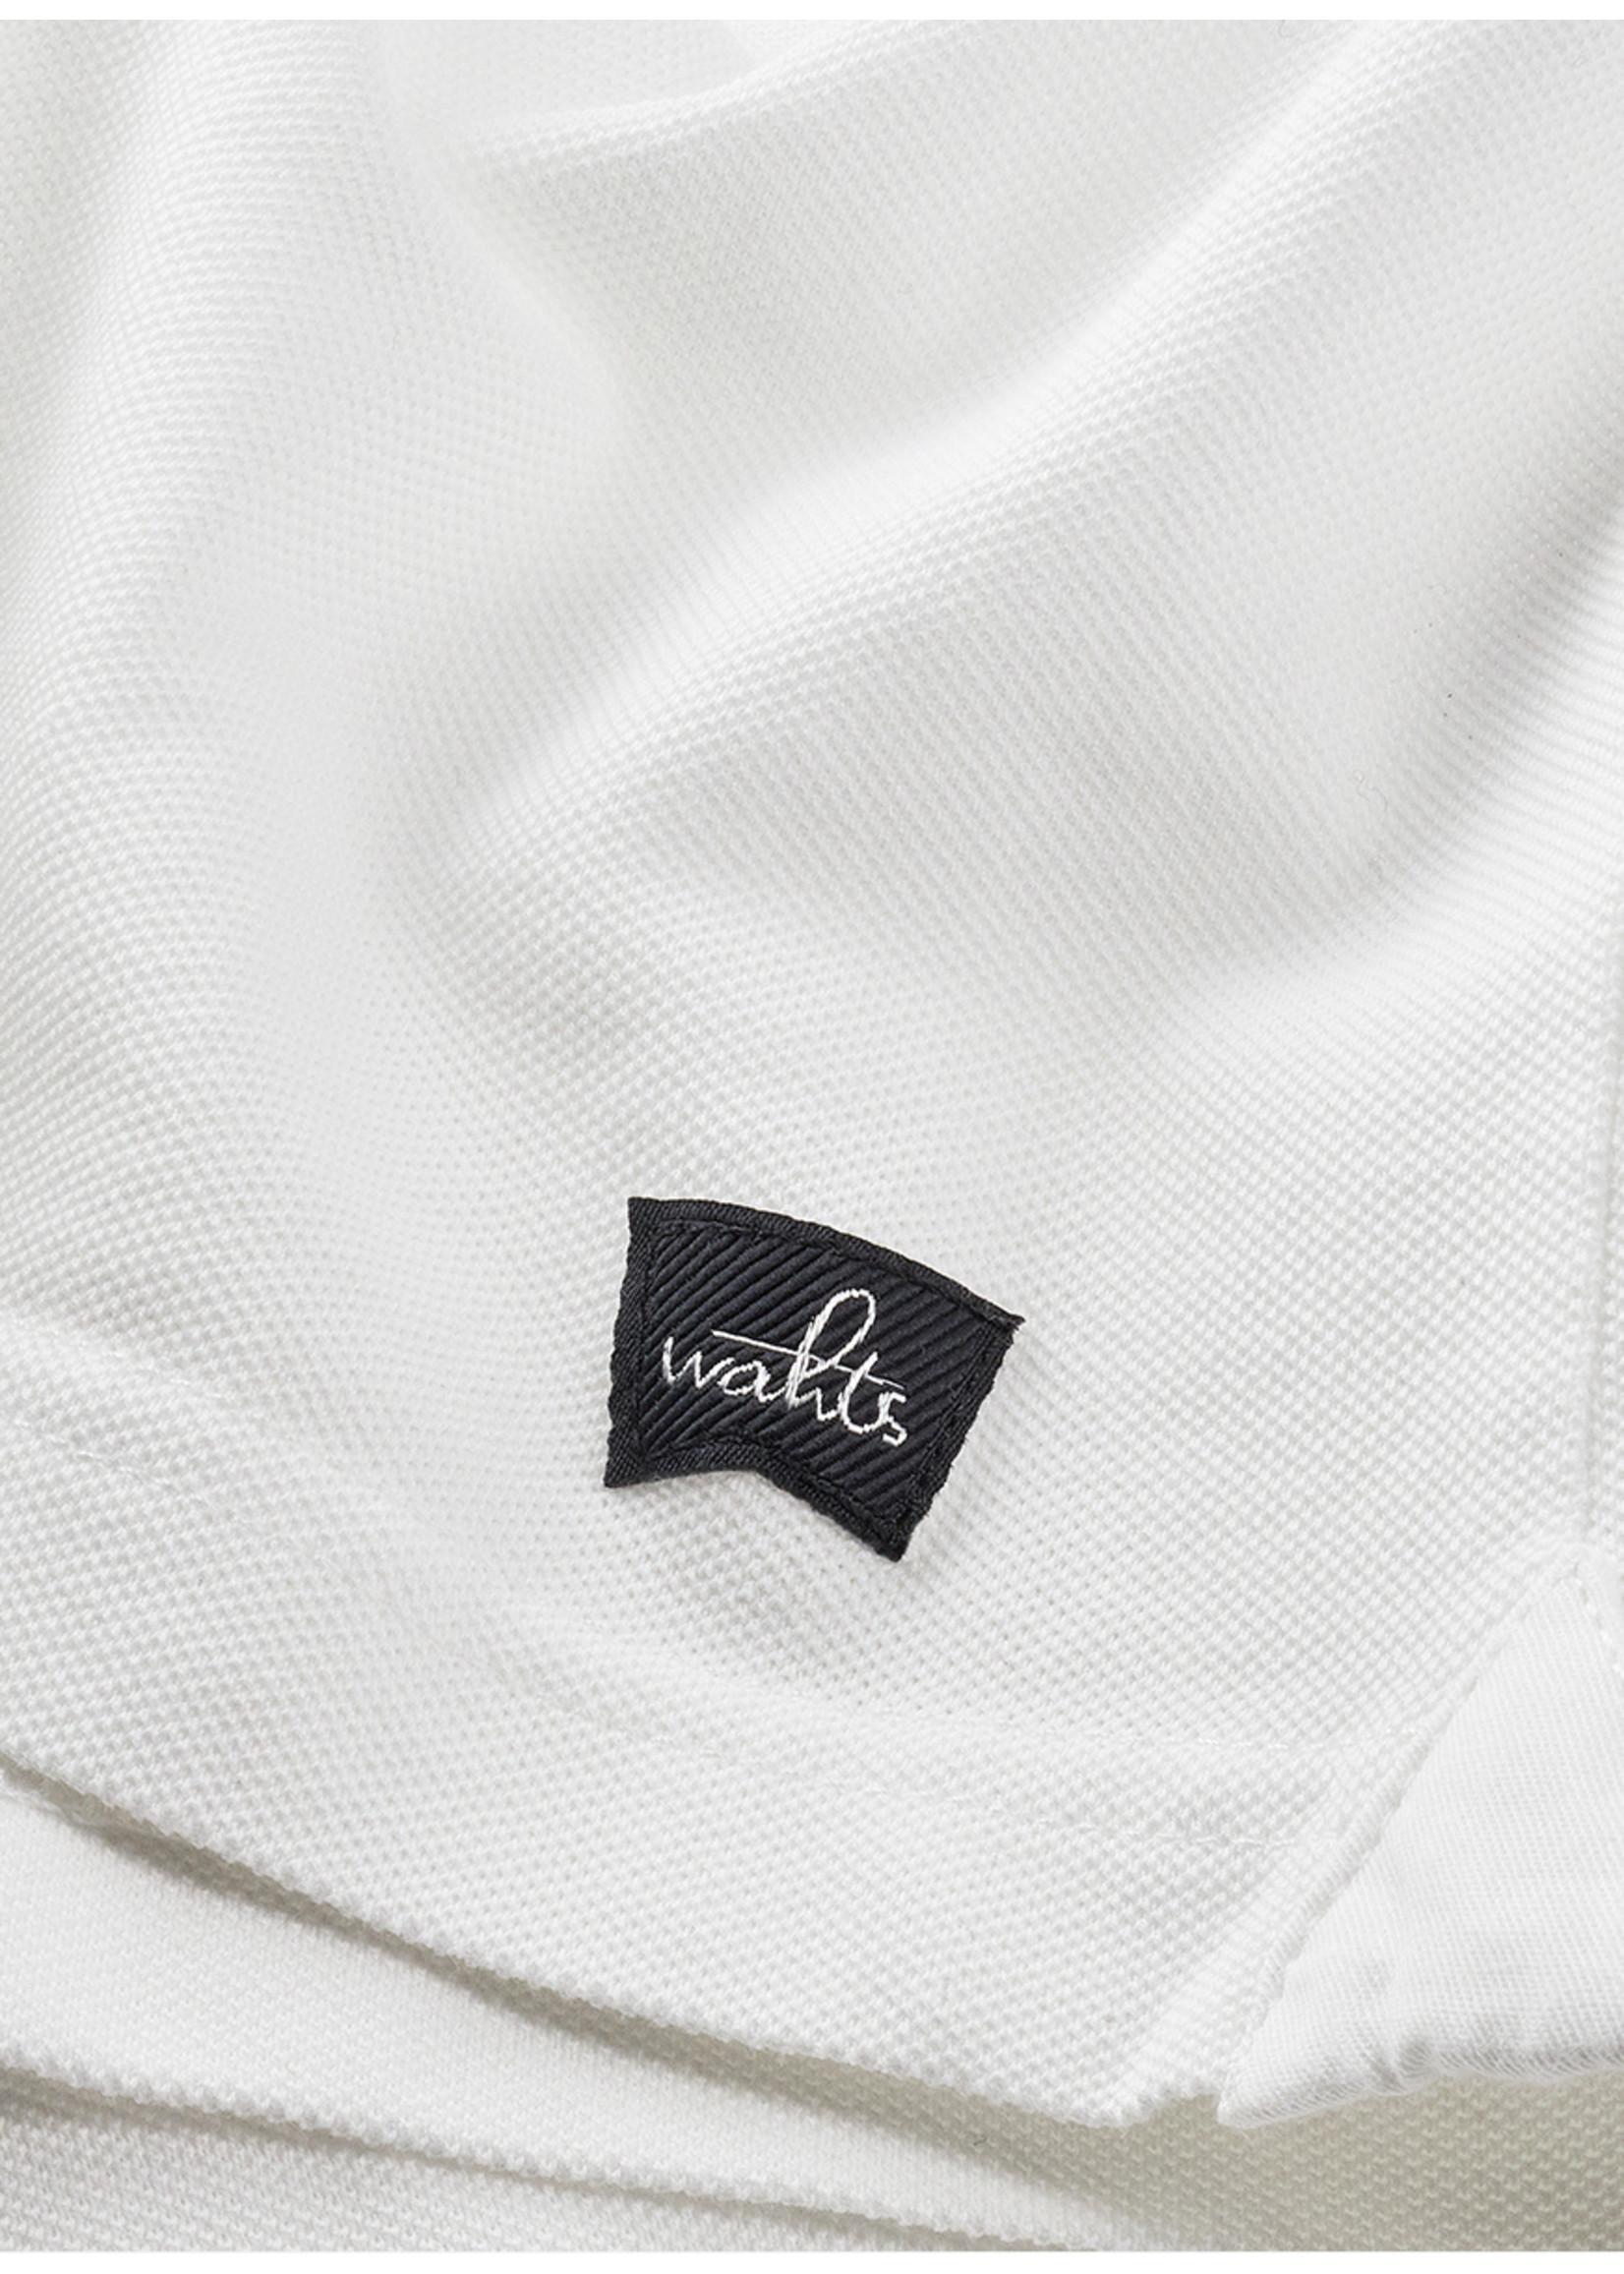 Wahts Davis tailored polo shirt pure white